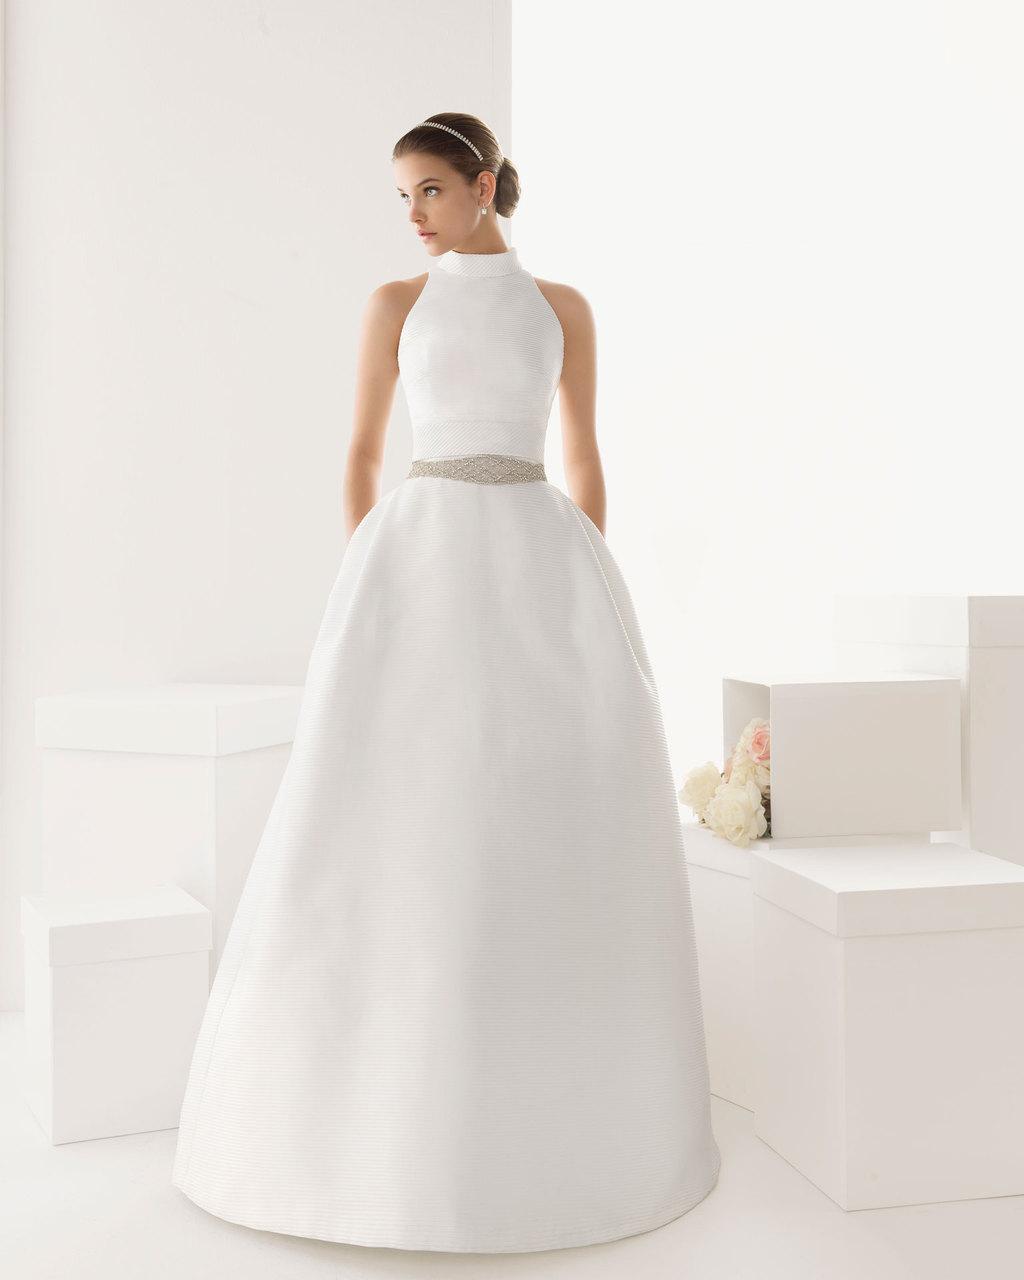 Transforming-wedding-dresses-2013-bridal-gown-by-rosa-clara-4.full